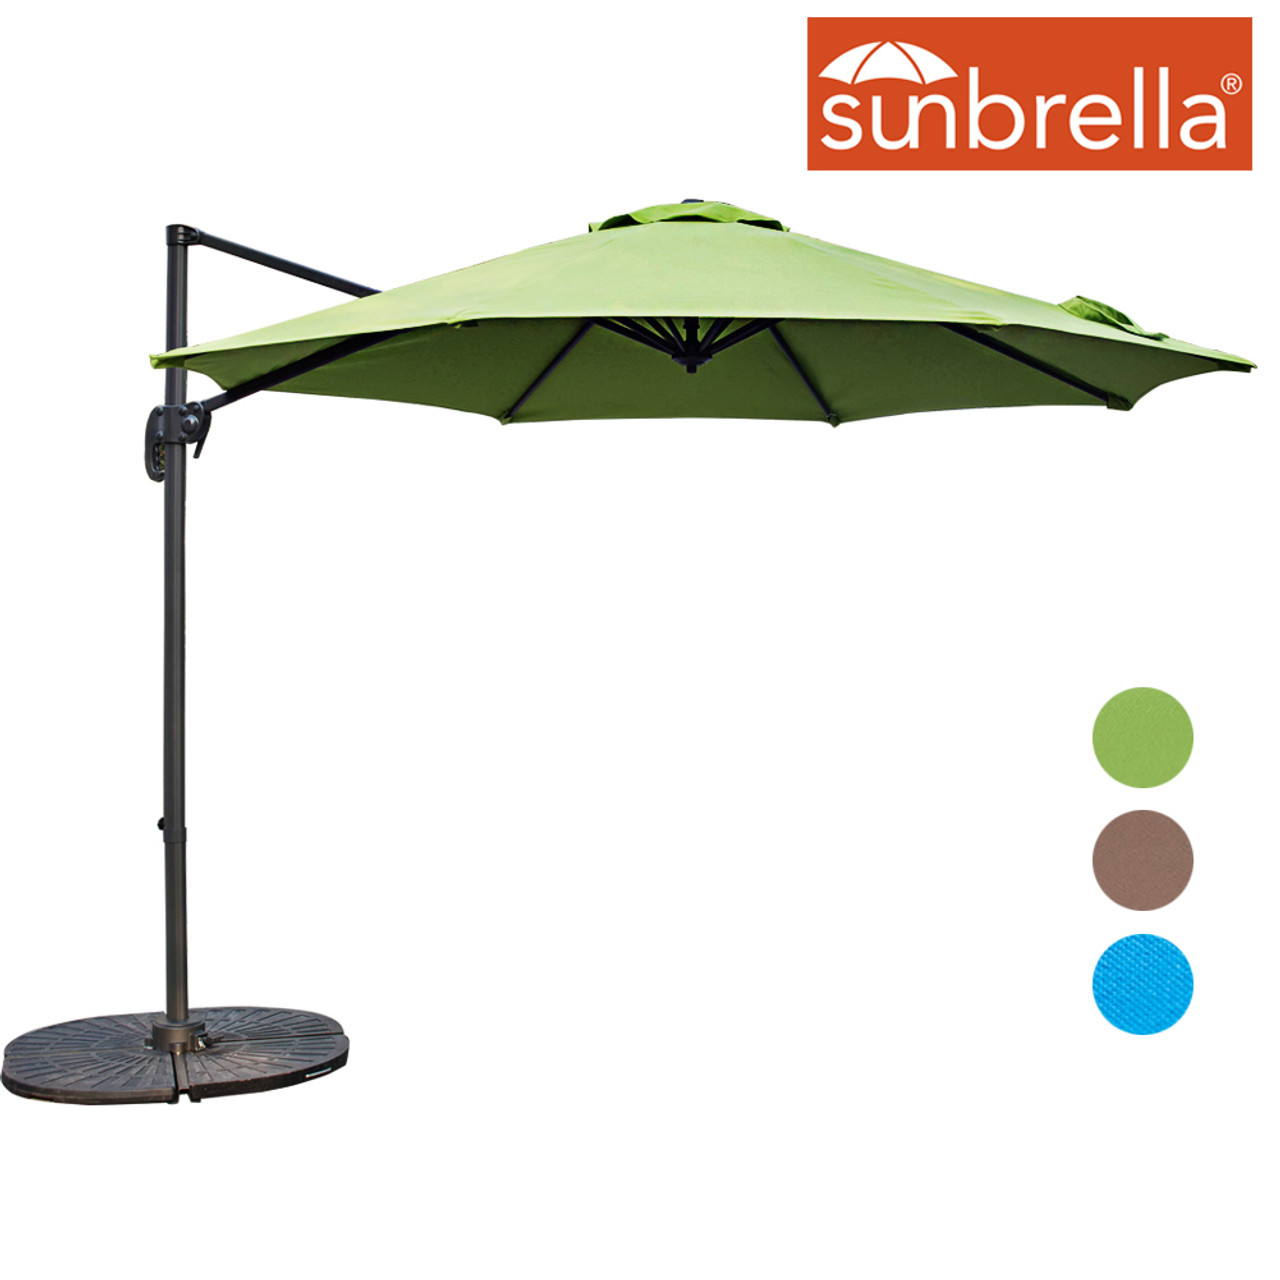 c428a1e947b4e Sundale Outdoor 10ft Sunbrella® Fabric Offset Hanging Umbrella Market Patio  Umbrella Aluminum Cantilever Pole with